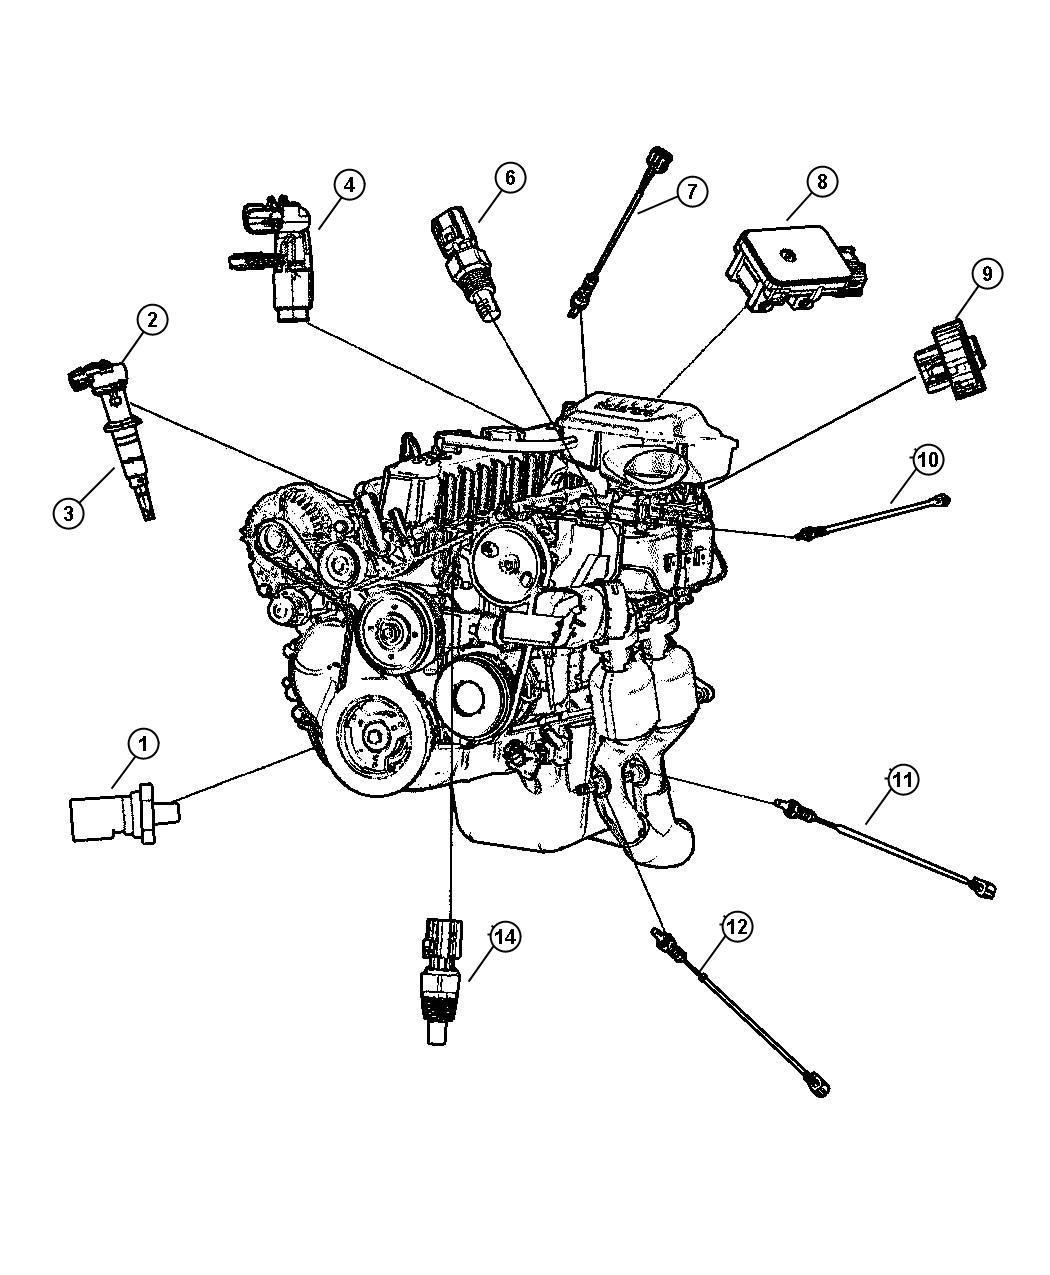 2001 Jeep Cherokee 4 0 Engine Emissions Diagram